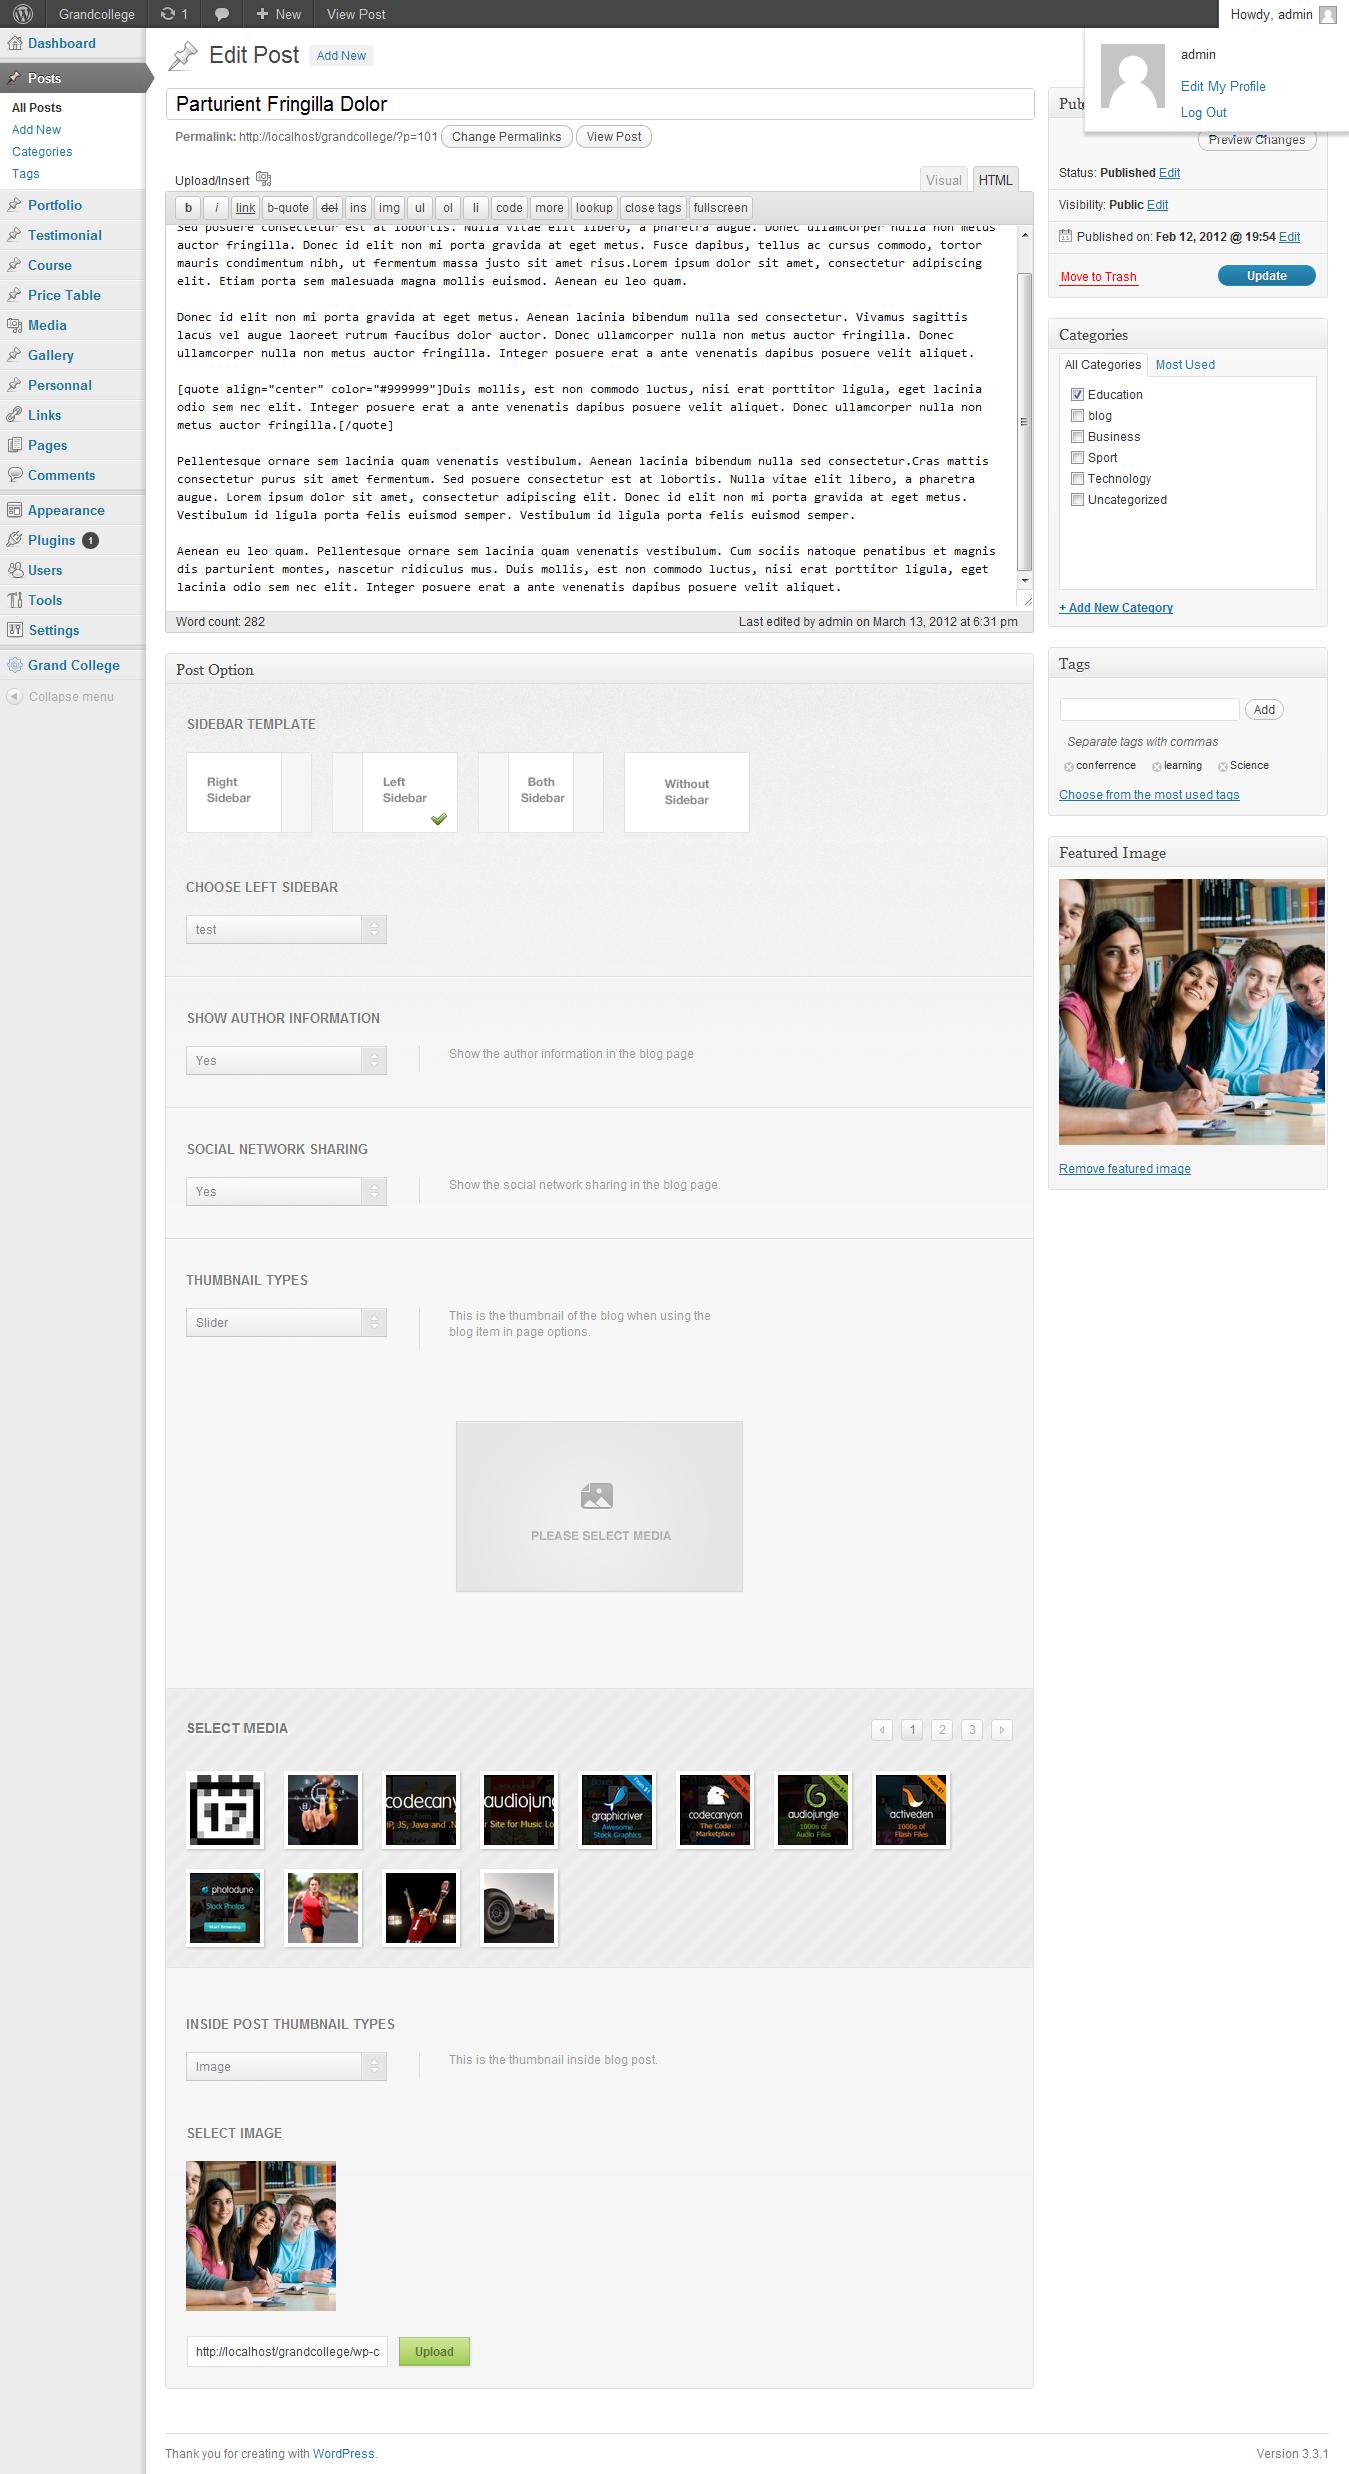 Grand College - Wordpress Theme For Education - adminpanel